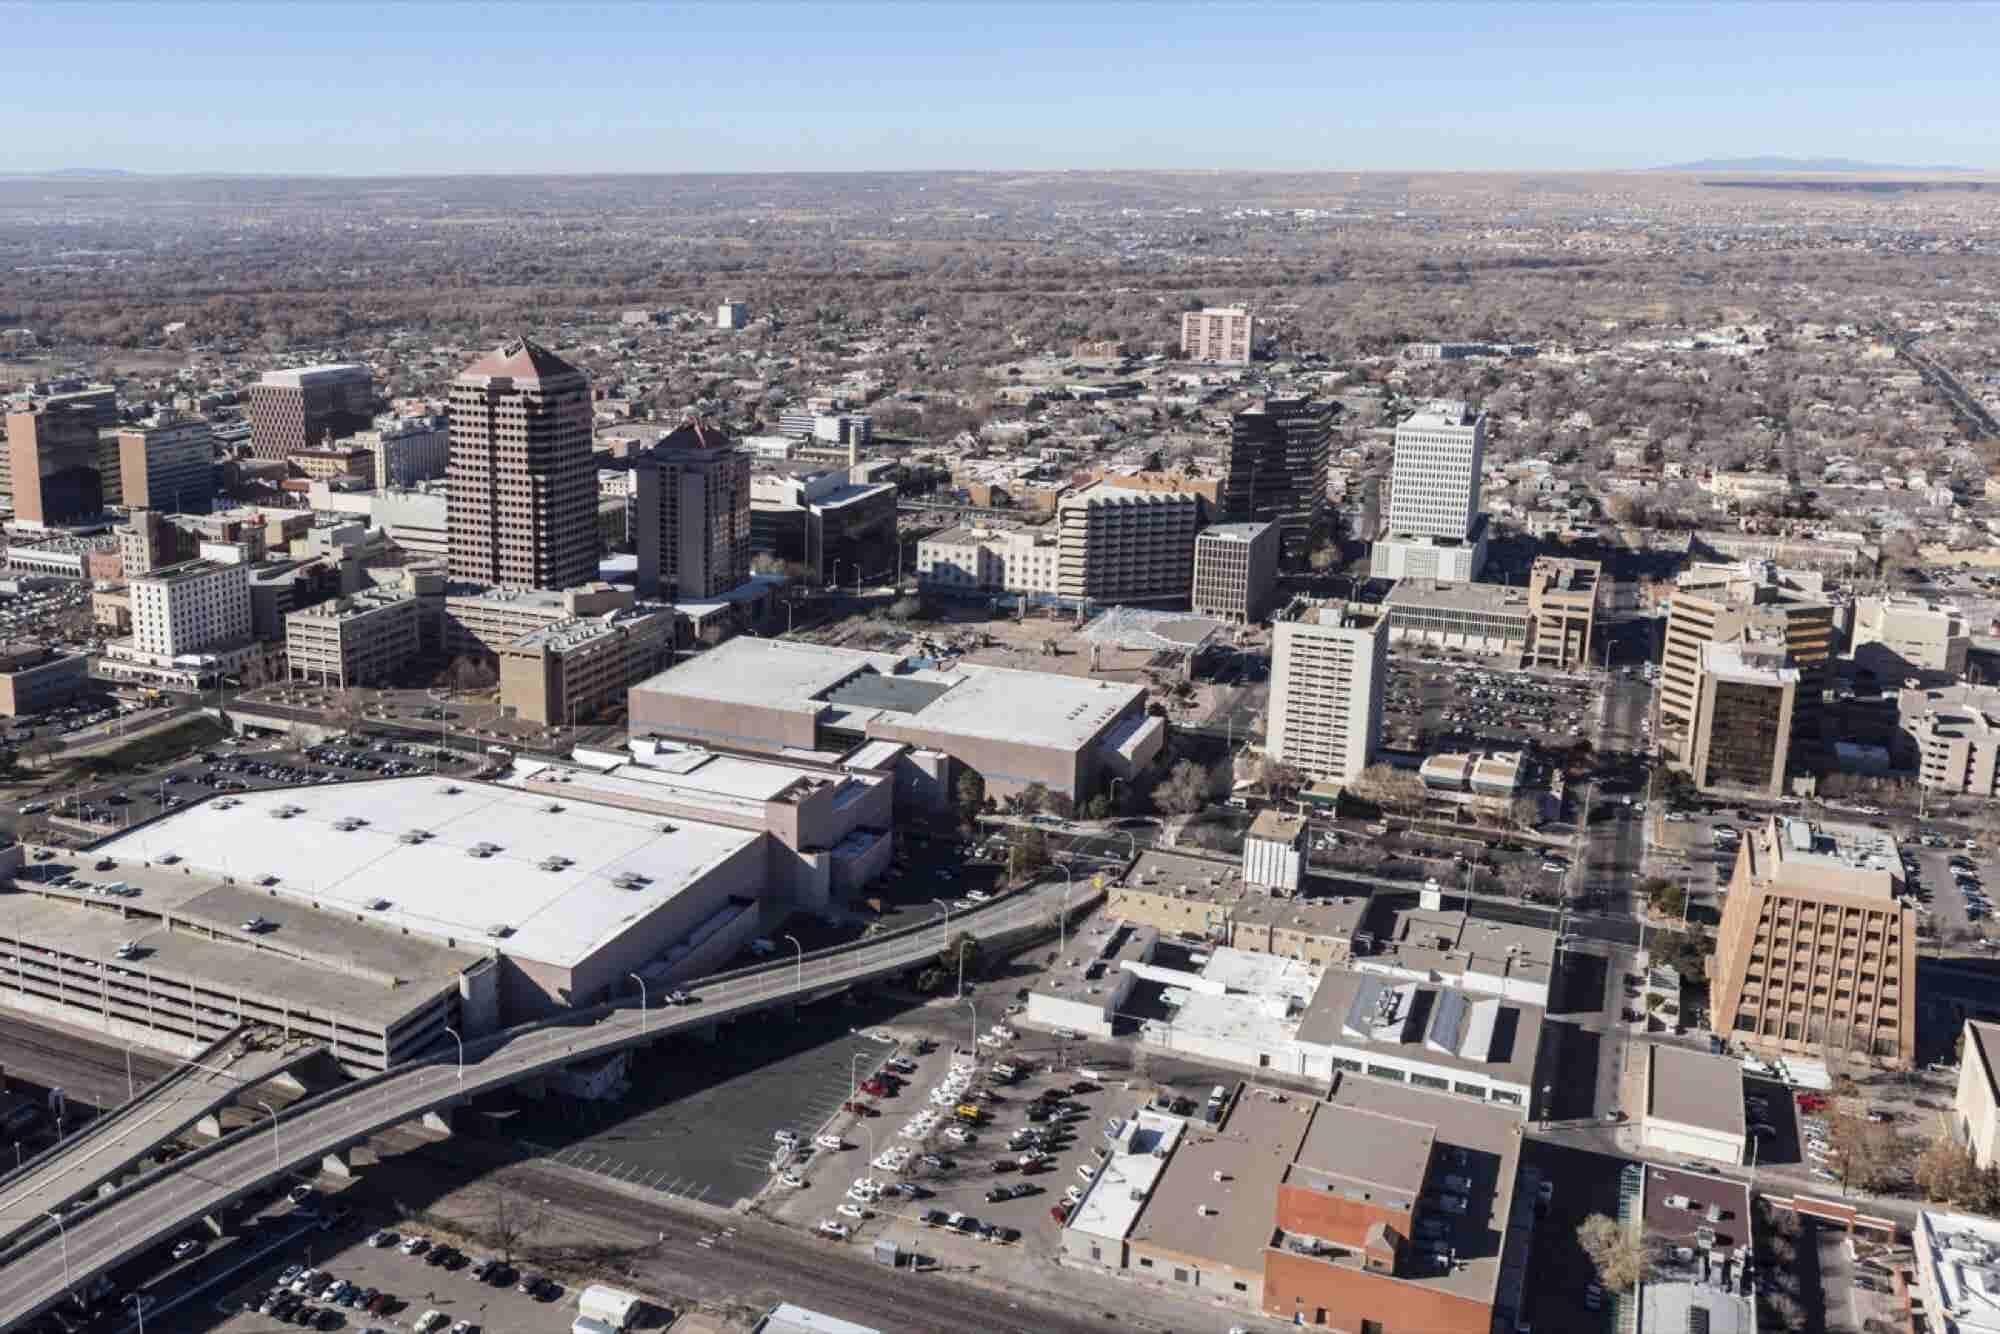 Albuquerque Has Embraced the Entrepreneurial Mindset for City Services